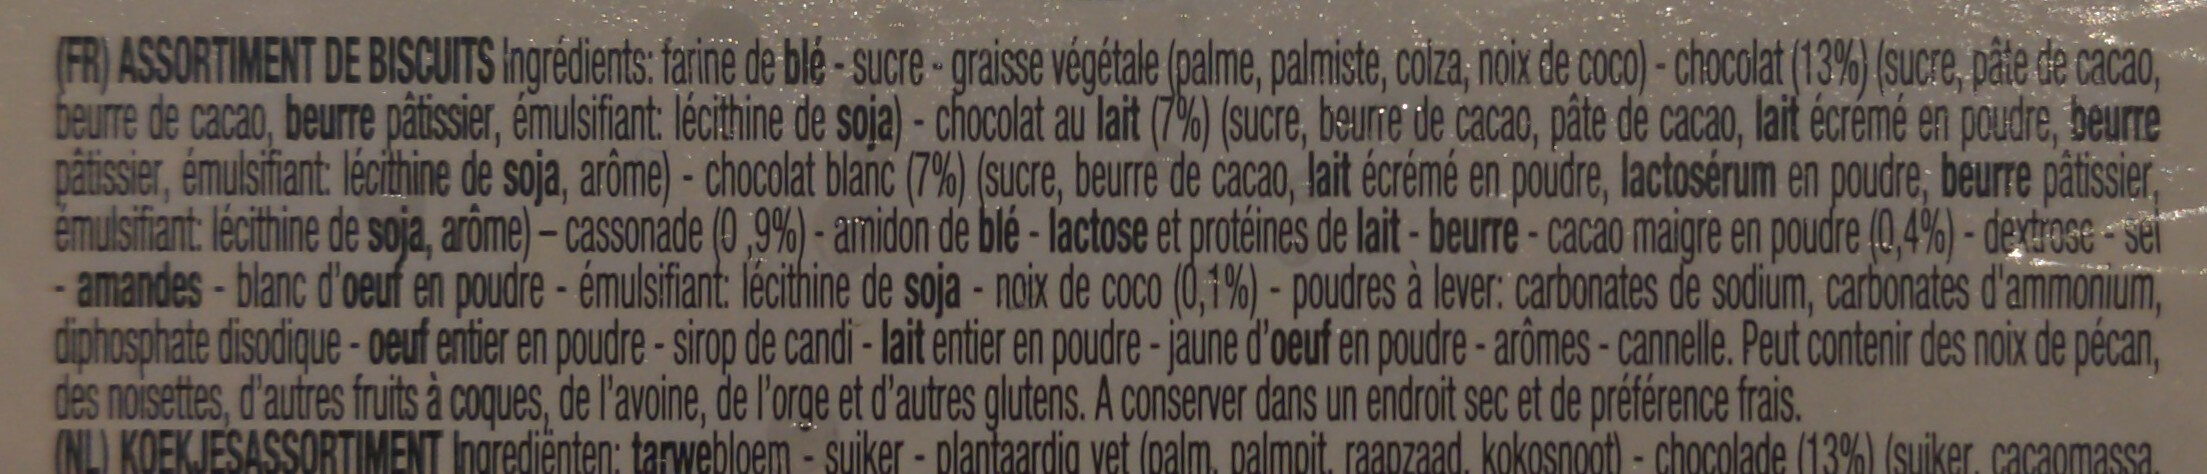 Delacre Tea Time - Ingrédients - fr